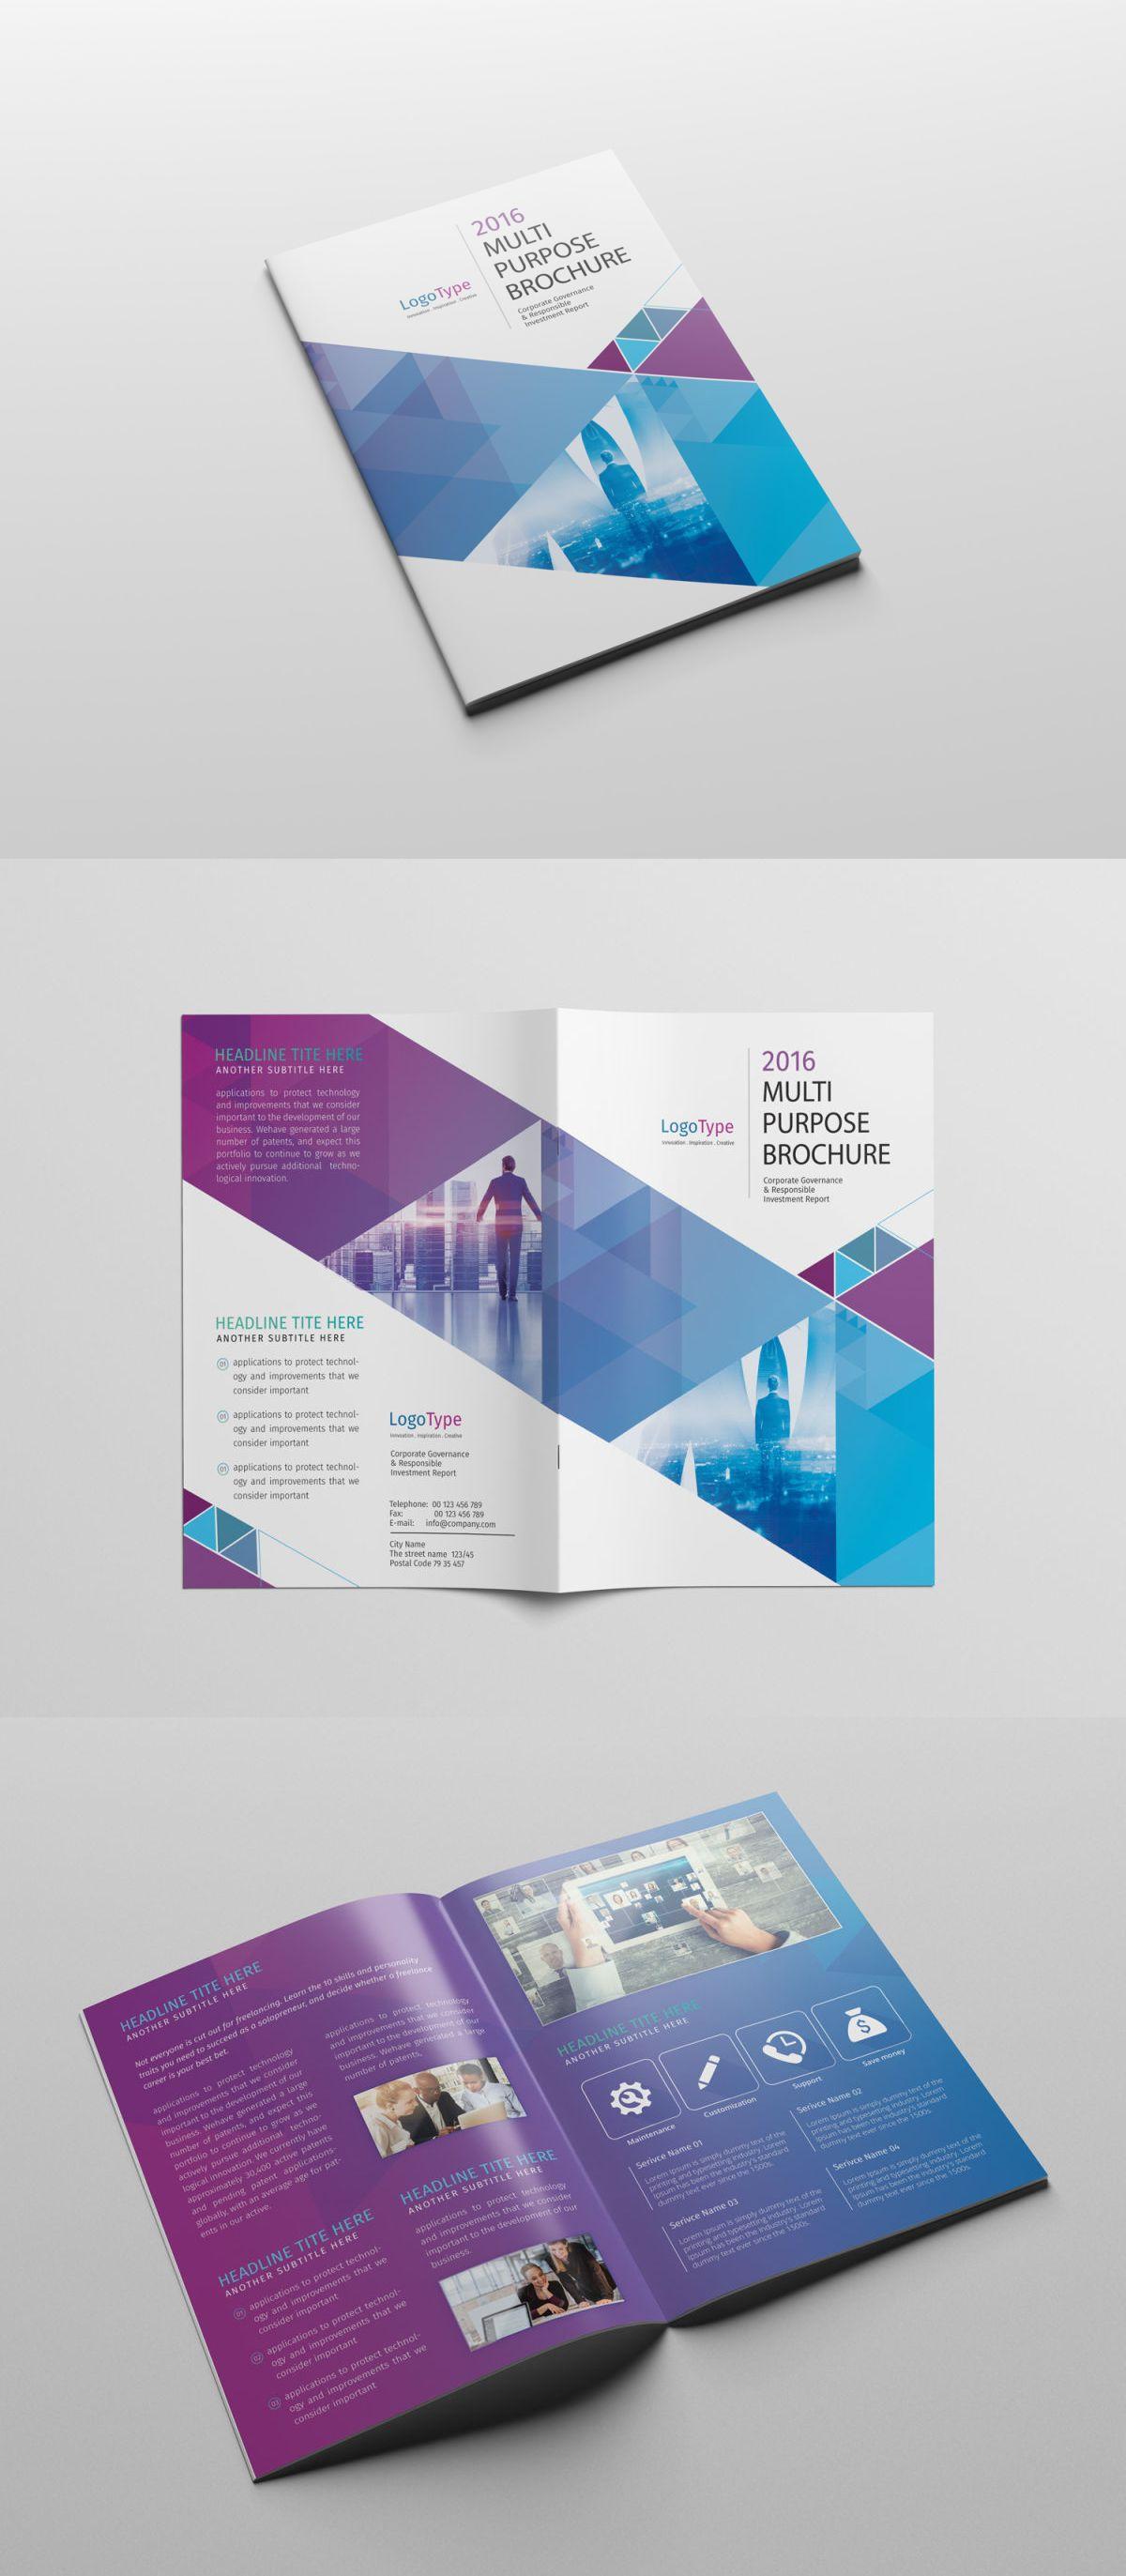 Abstract BiFold Brochure Template PSD Brochure Templates - Double fold brochure template